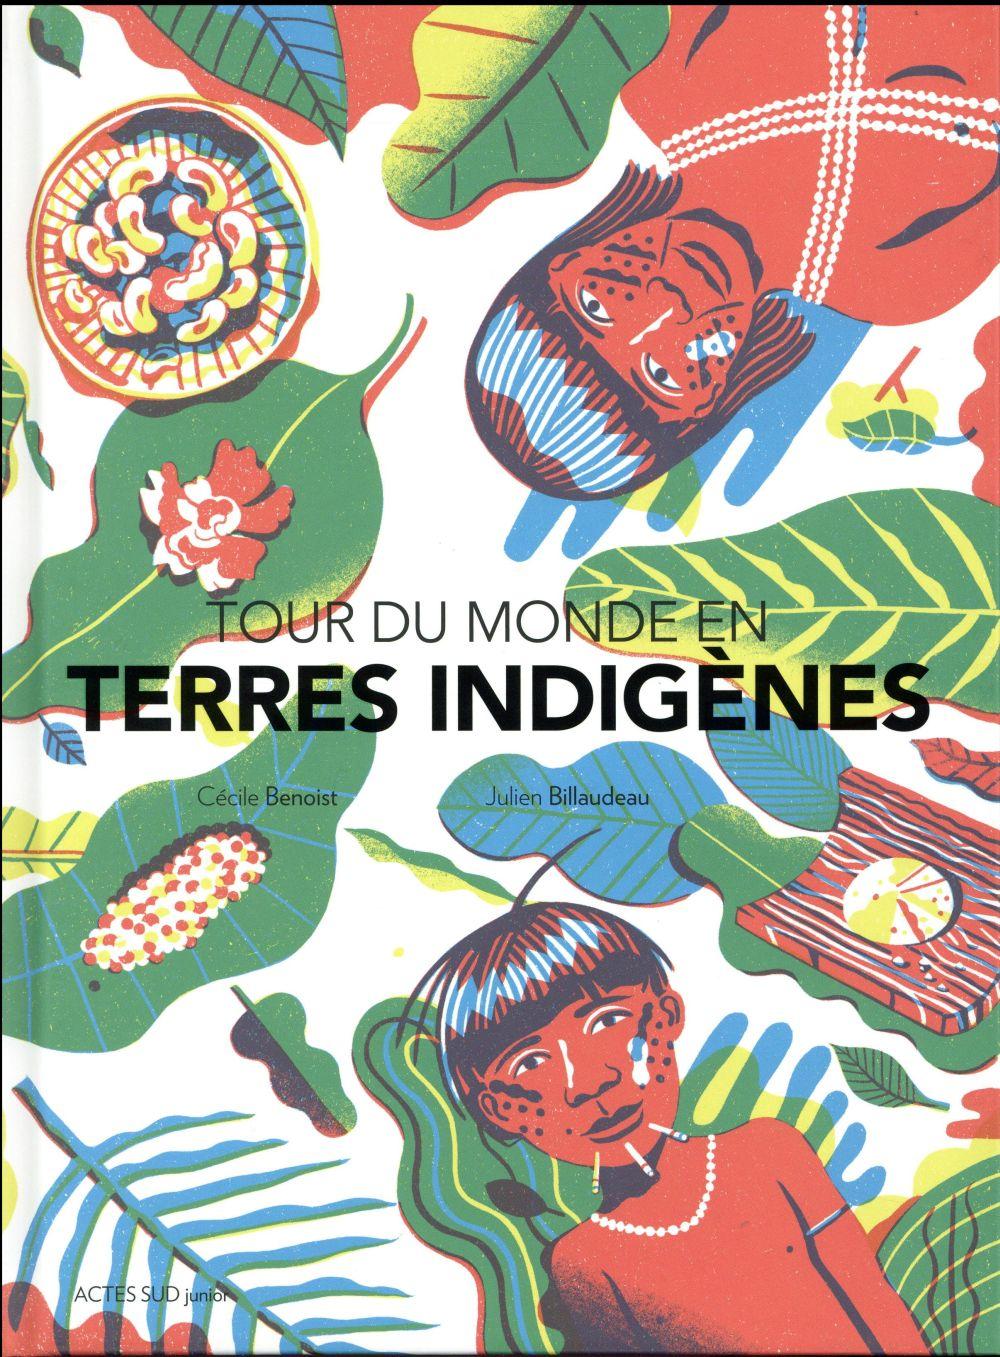 Tour du monde en terres indigènes